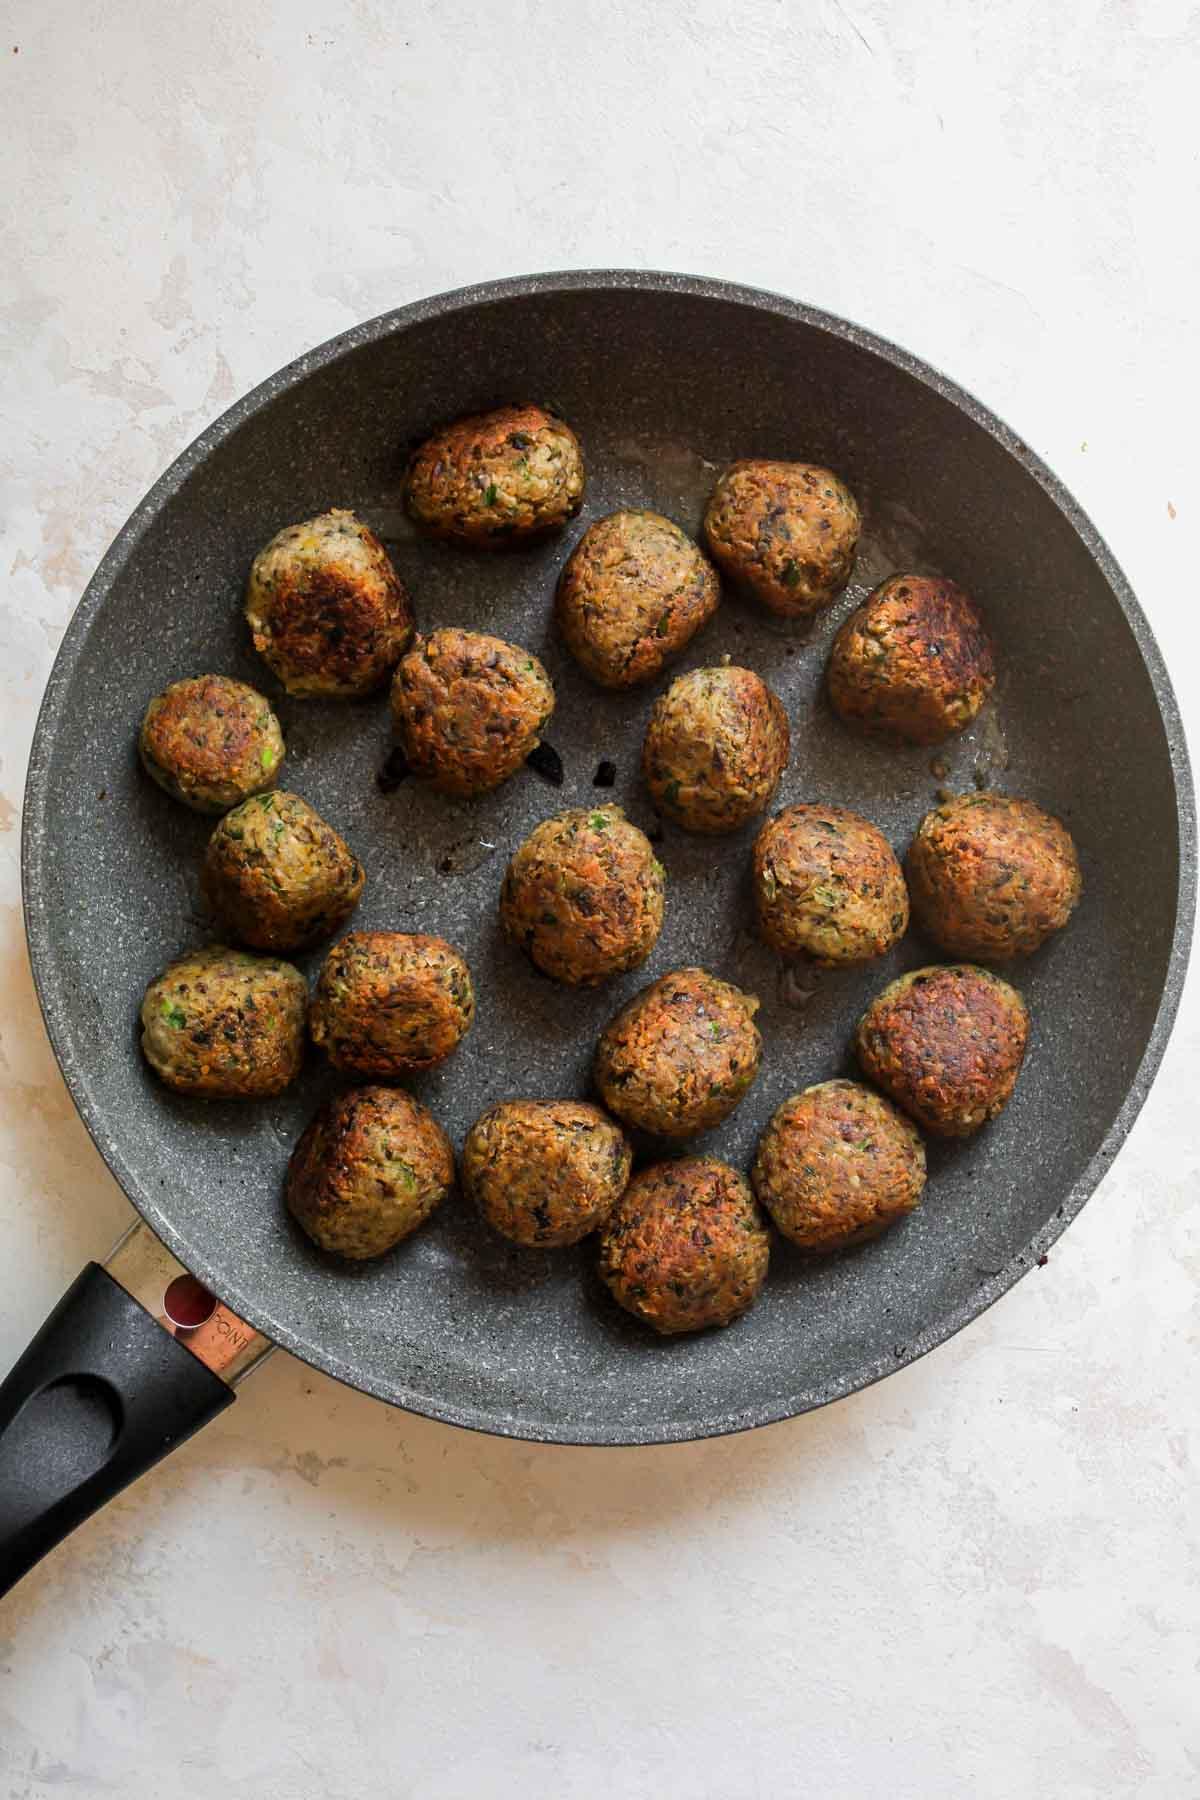 Mushroom meatballs being sautéed in a skillet